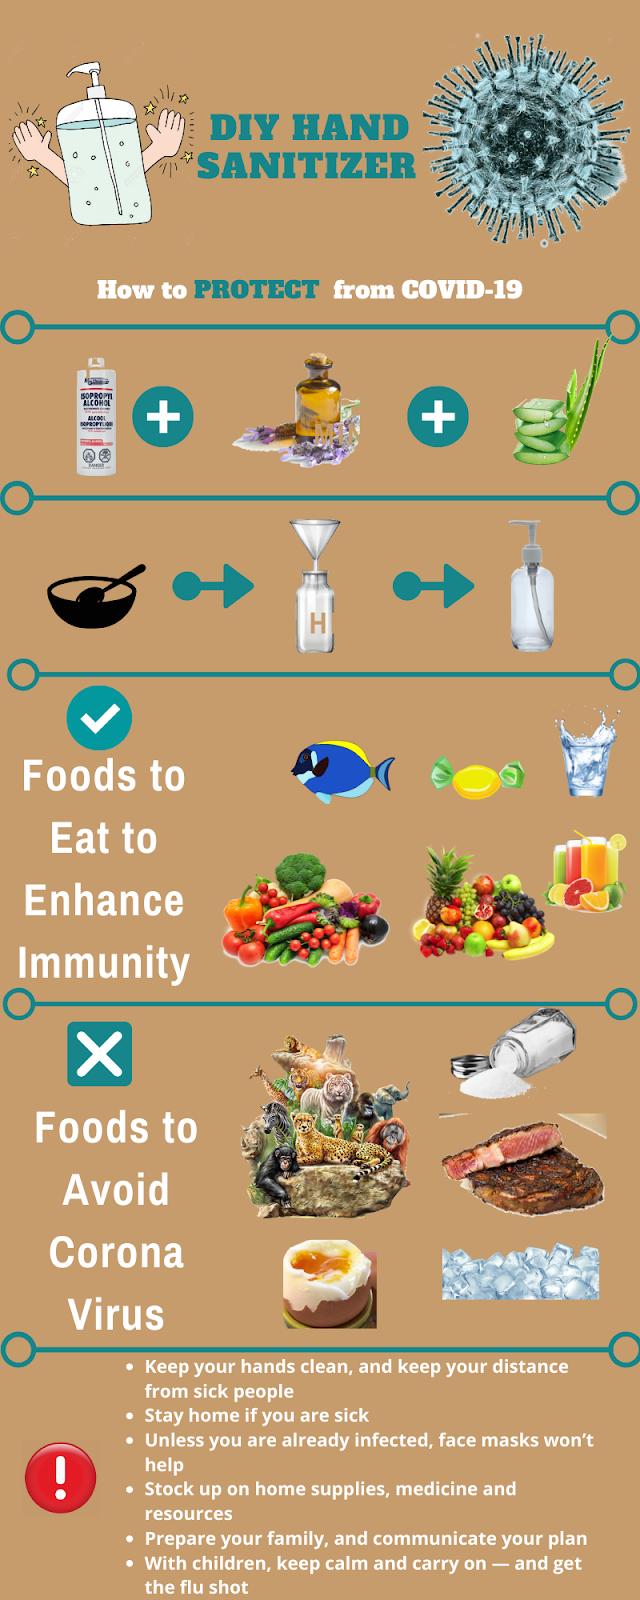 how to protect form Coronavirus